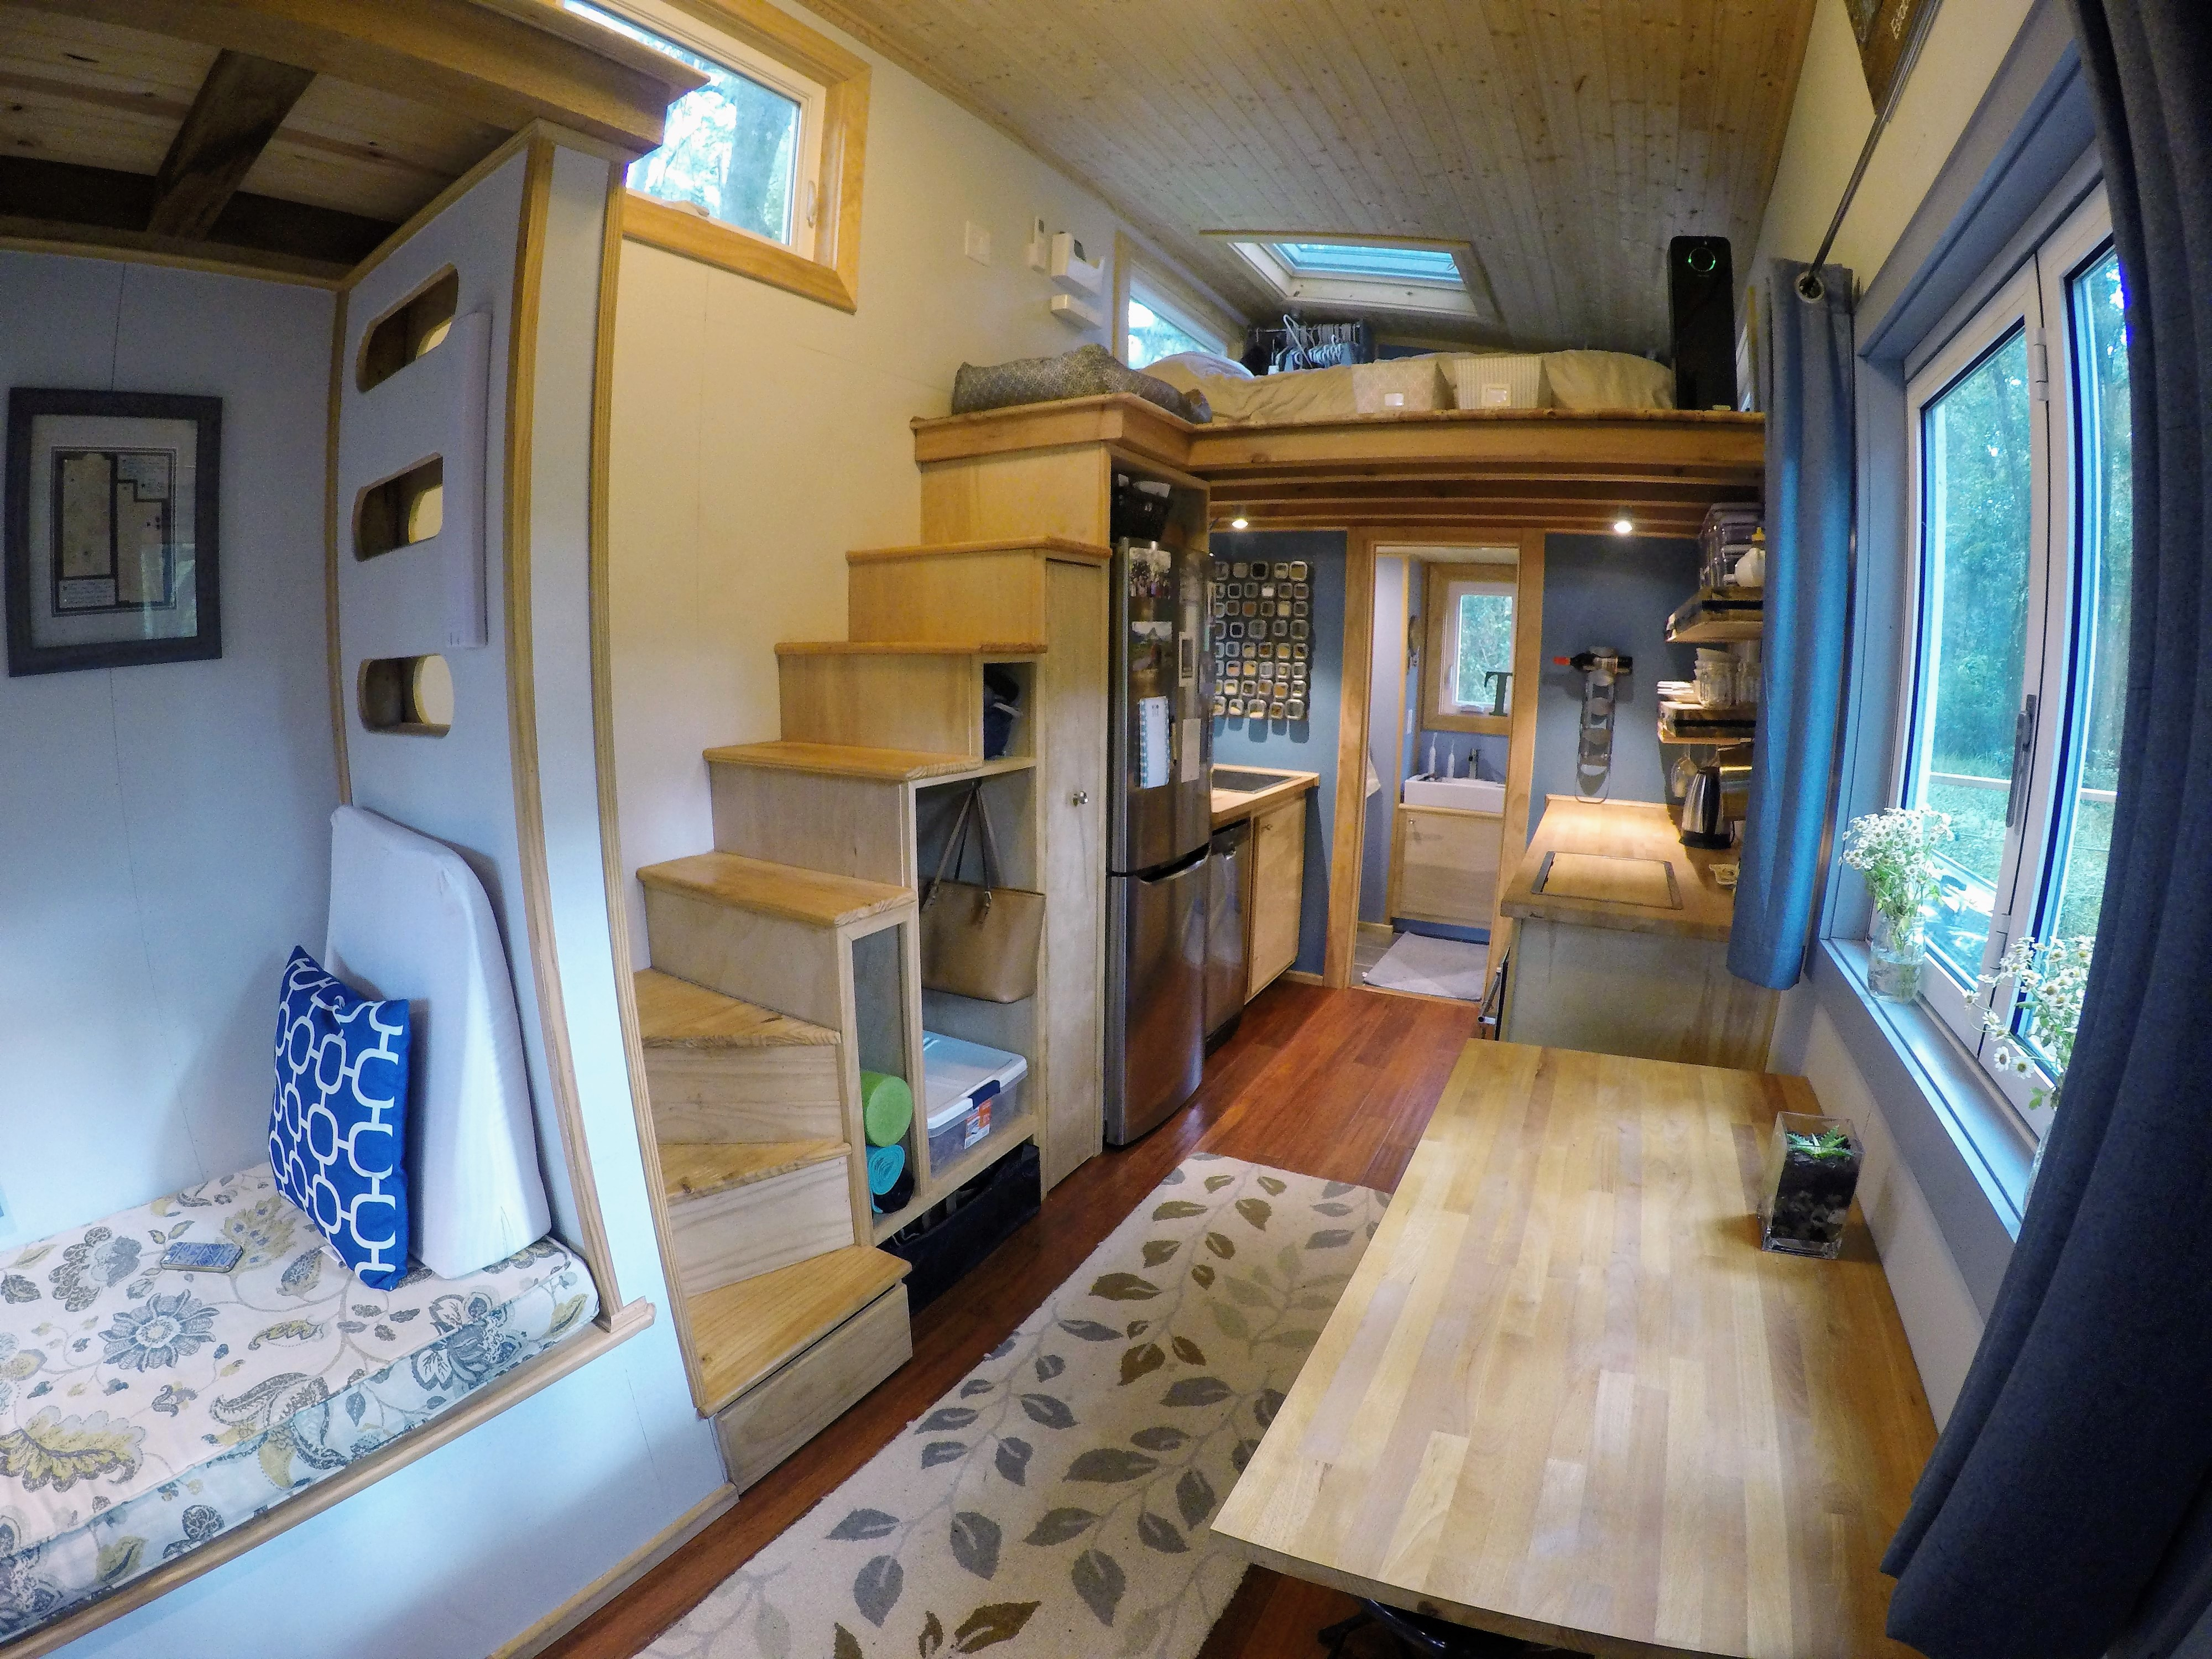 Austin & Heidi's Tiny House Creates Contentment